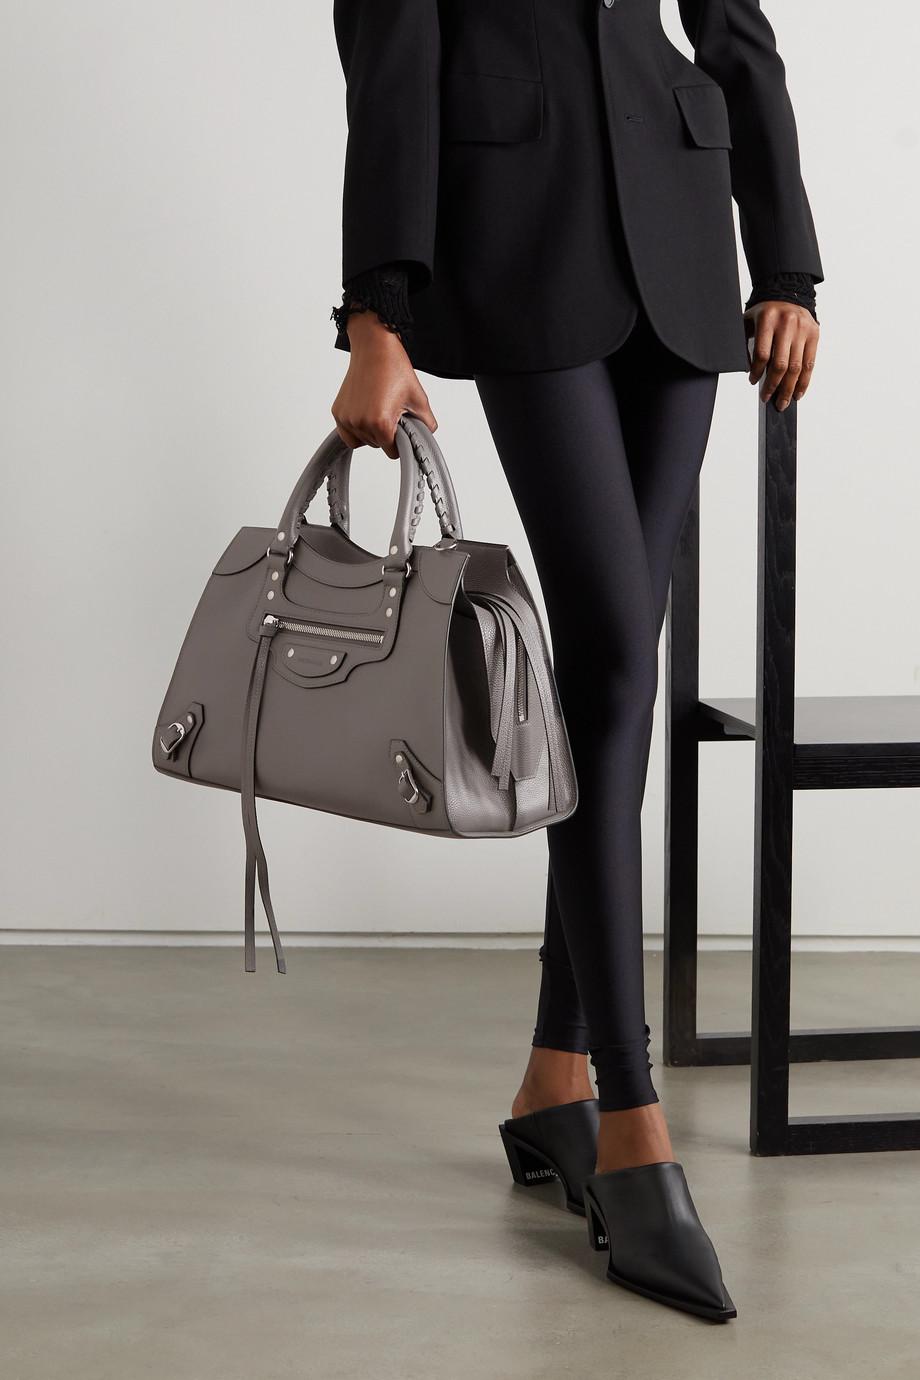 Balenciaga Neo Classic City medium textured-leather tote